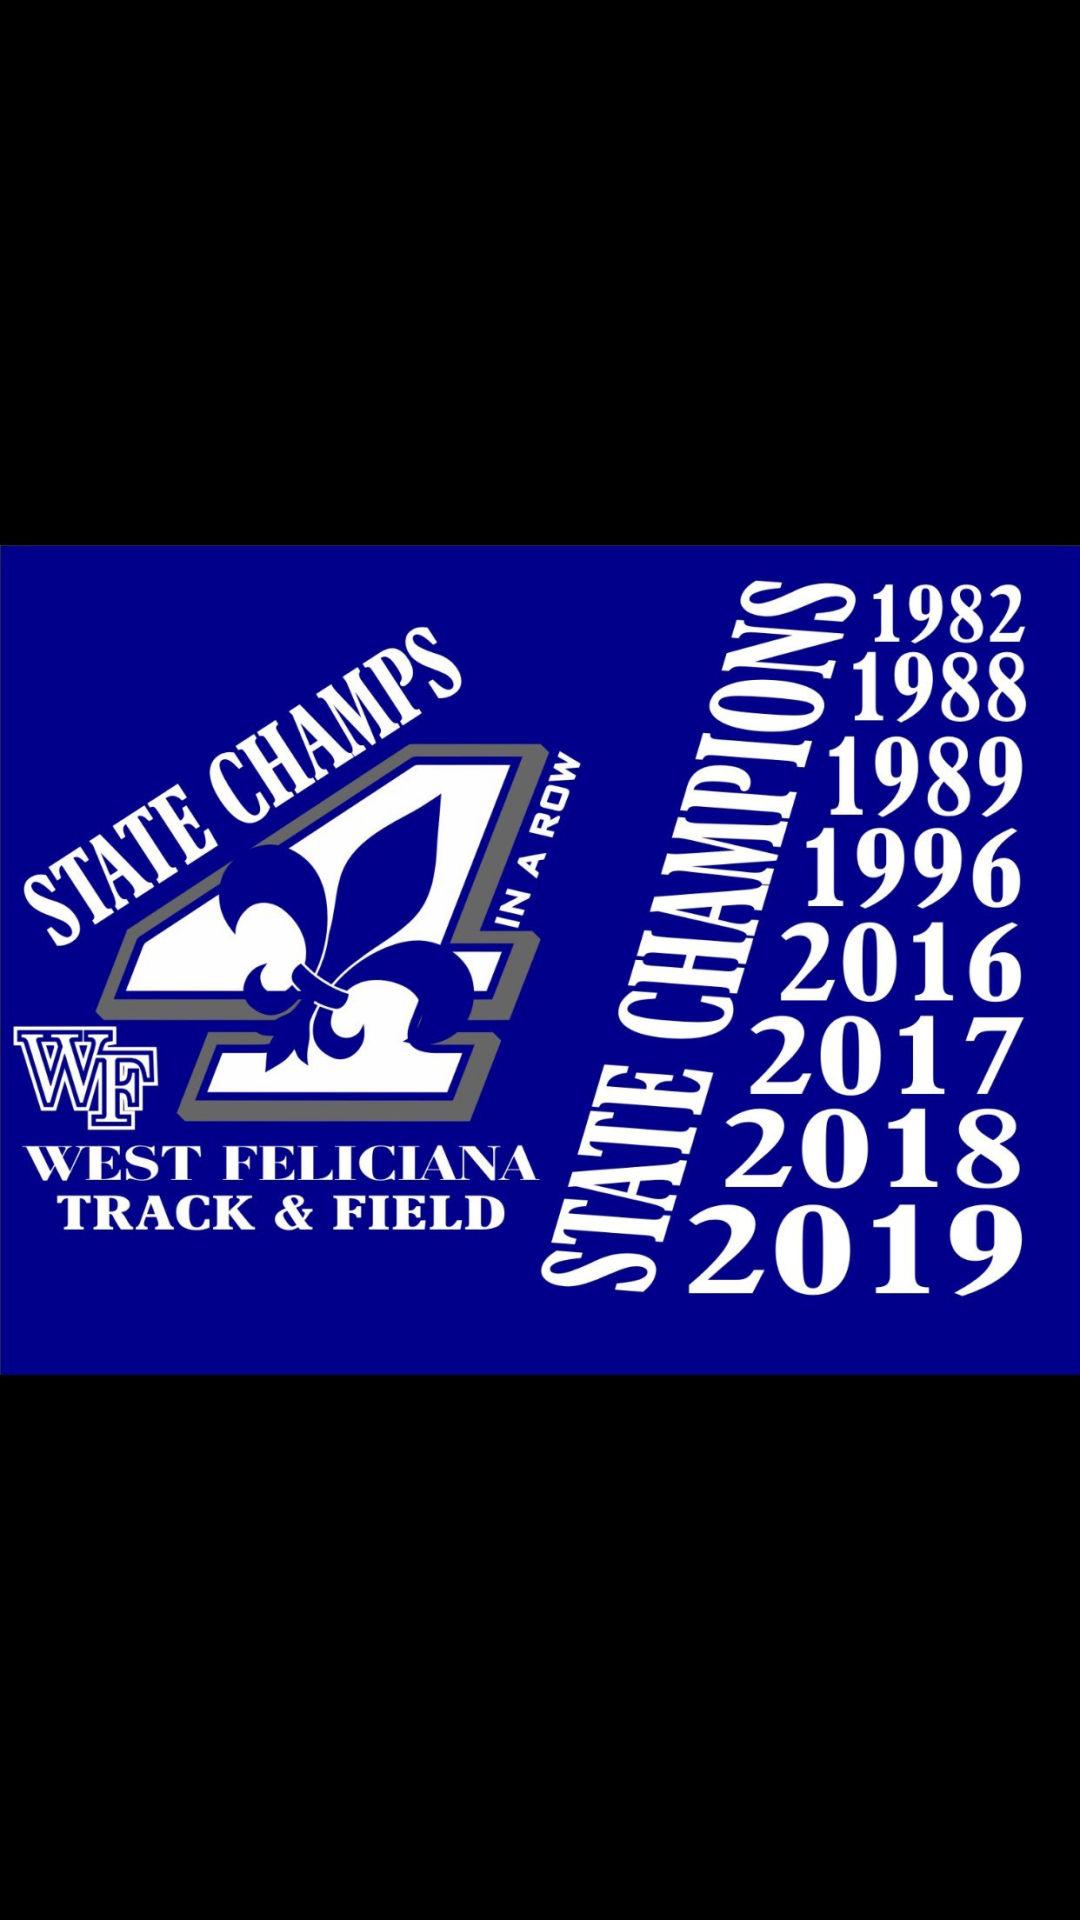 West Feliciana Championship T-Shirt Design.jpg